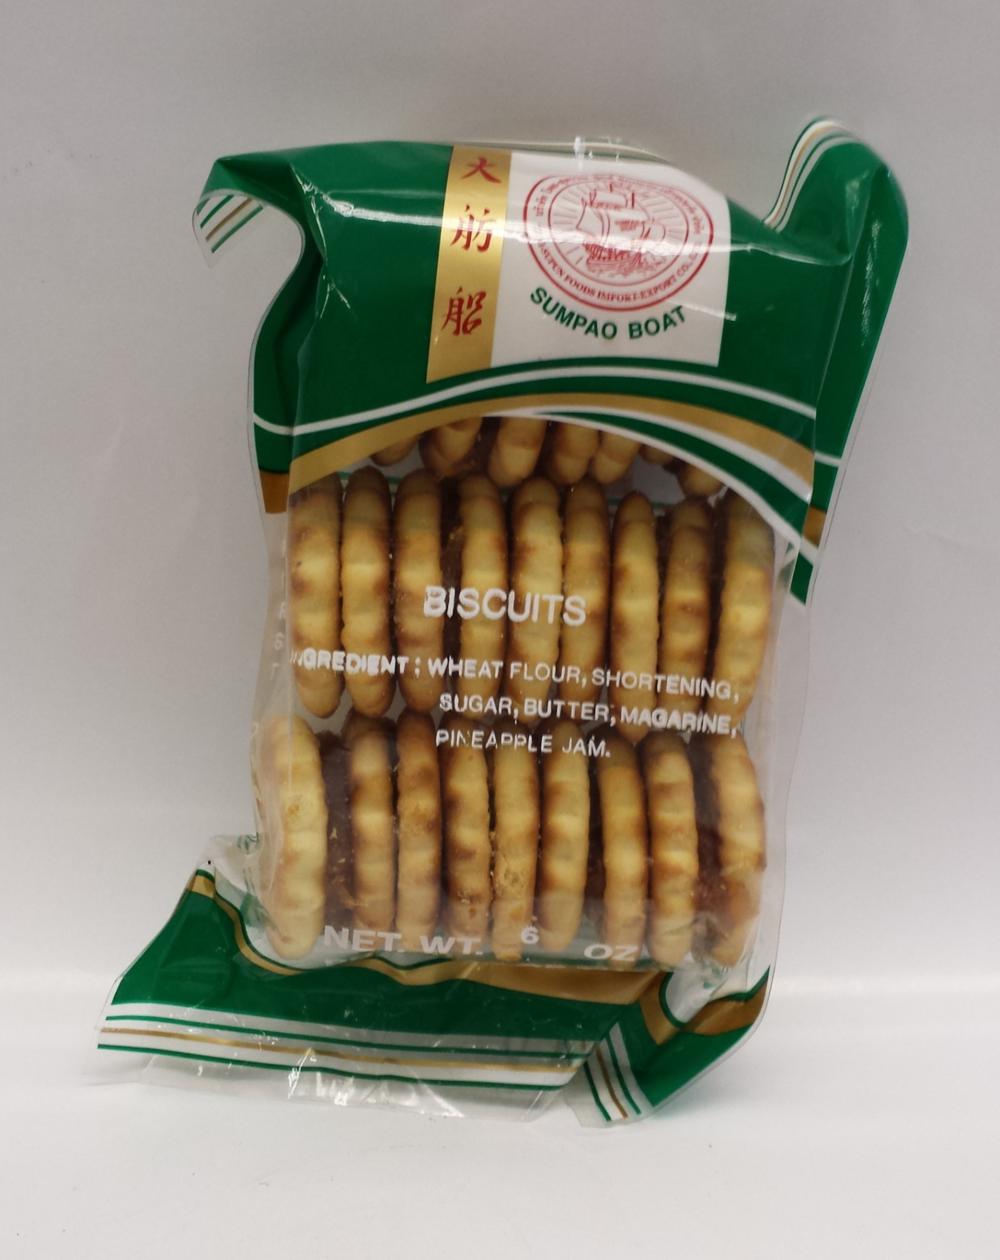 Pineapple Biscuit, Medium   Sumpao Boat   CK16330 36x6 oz